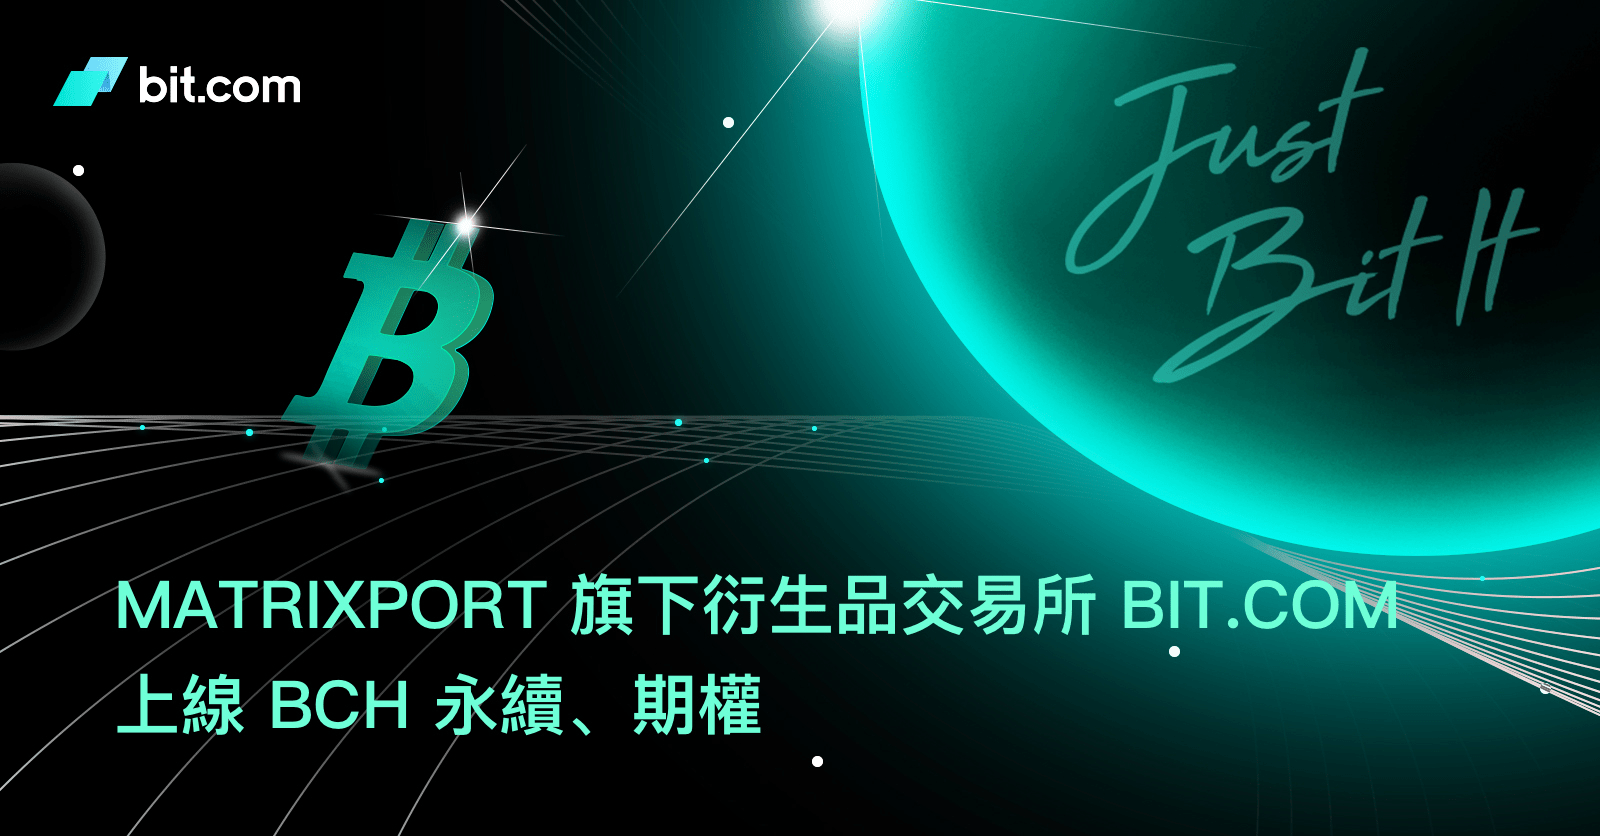 Matrixport 旗下衍生品交易所 Bit.com 上線 BCH 永續、期權